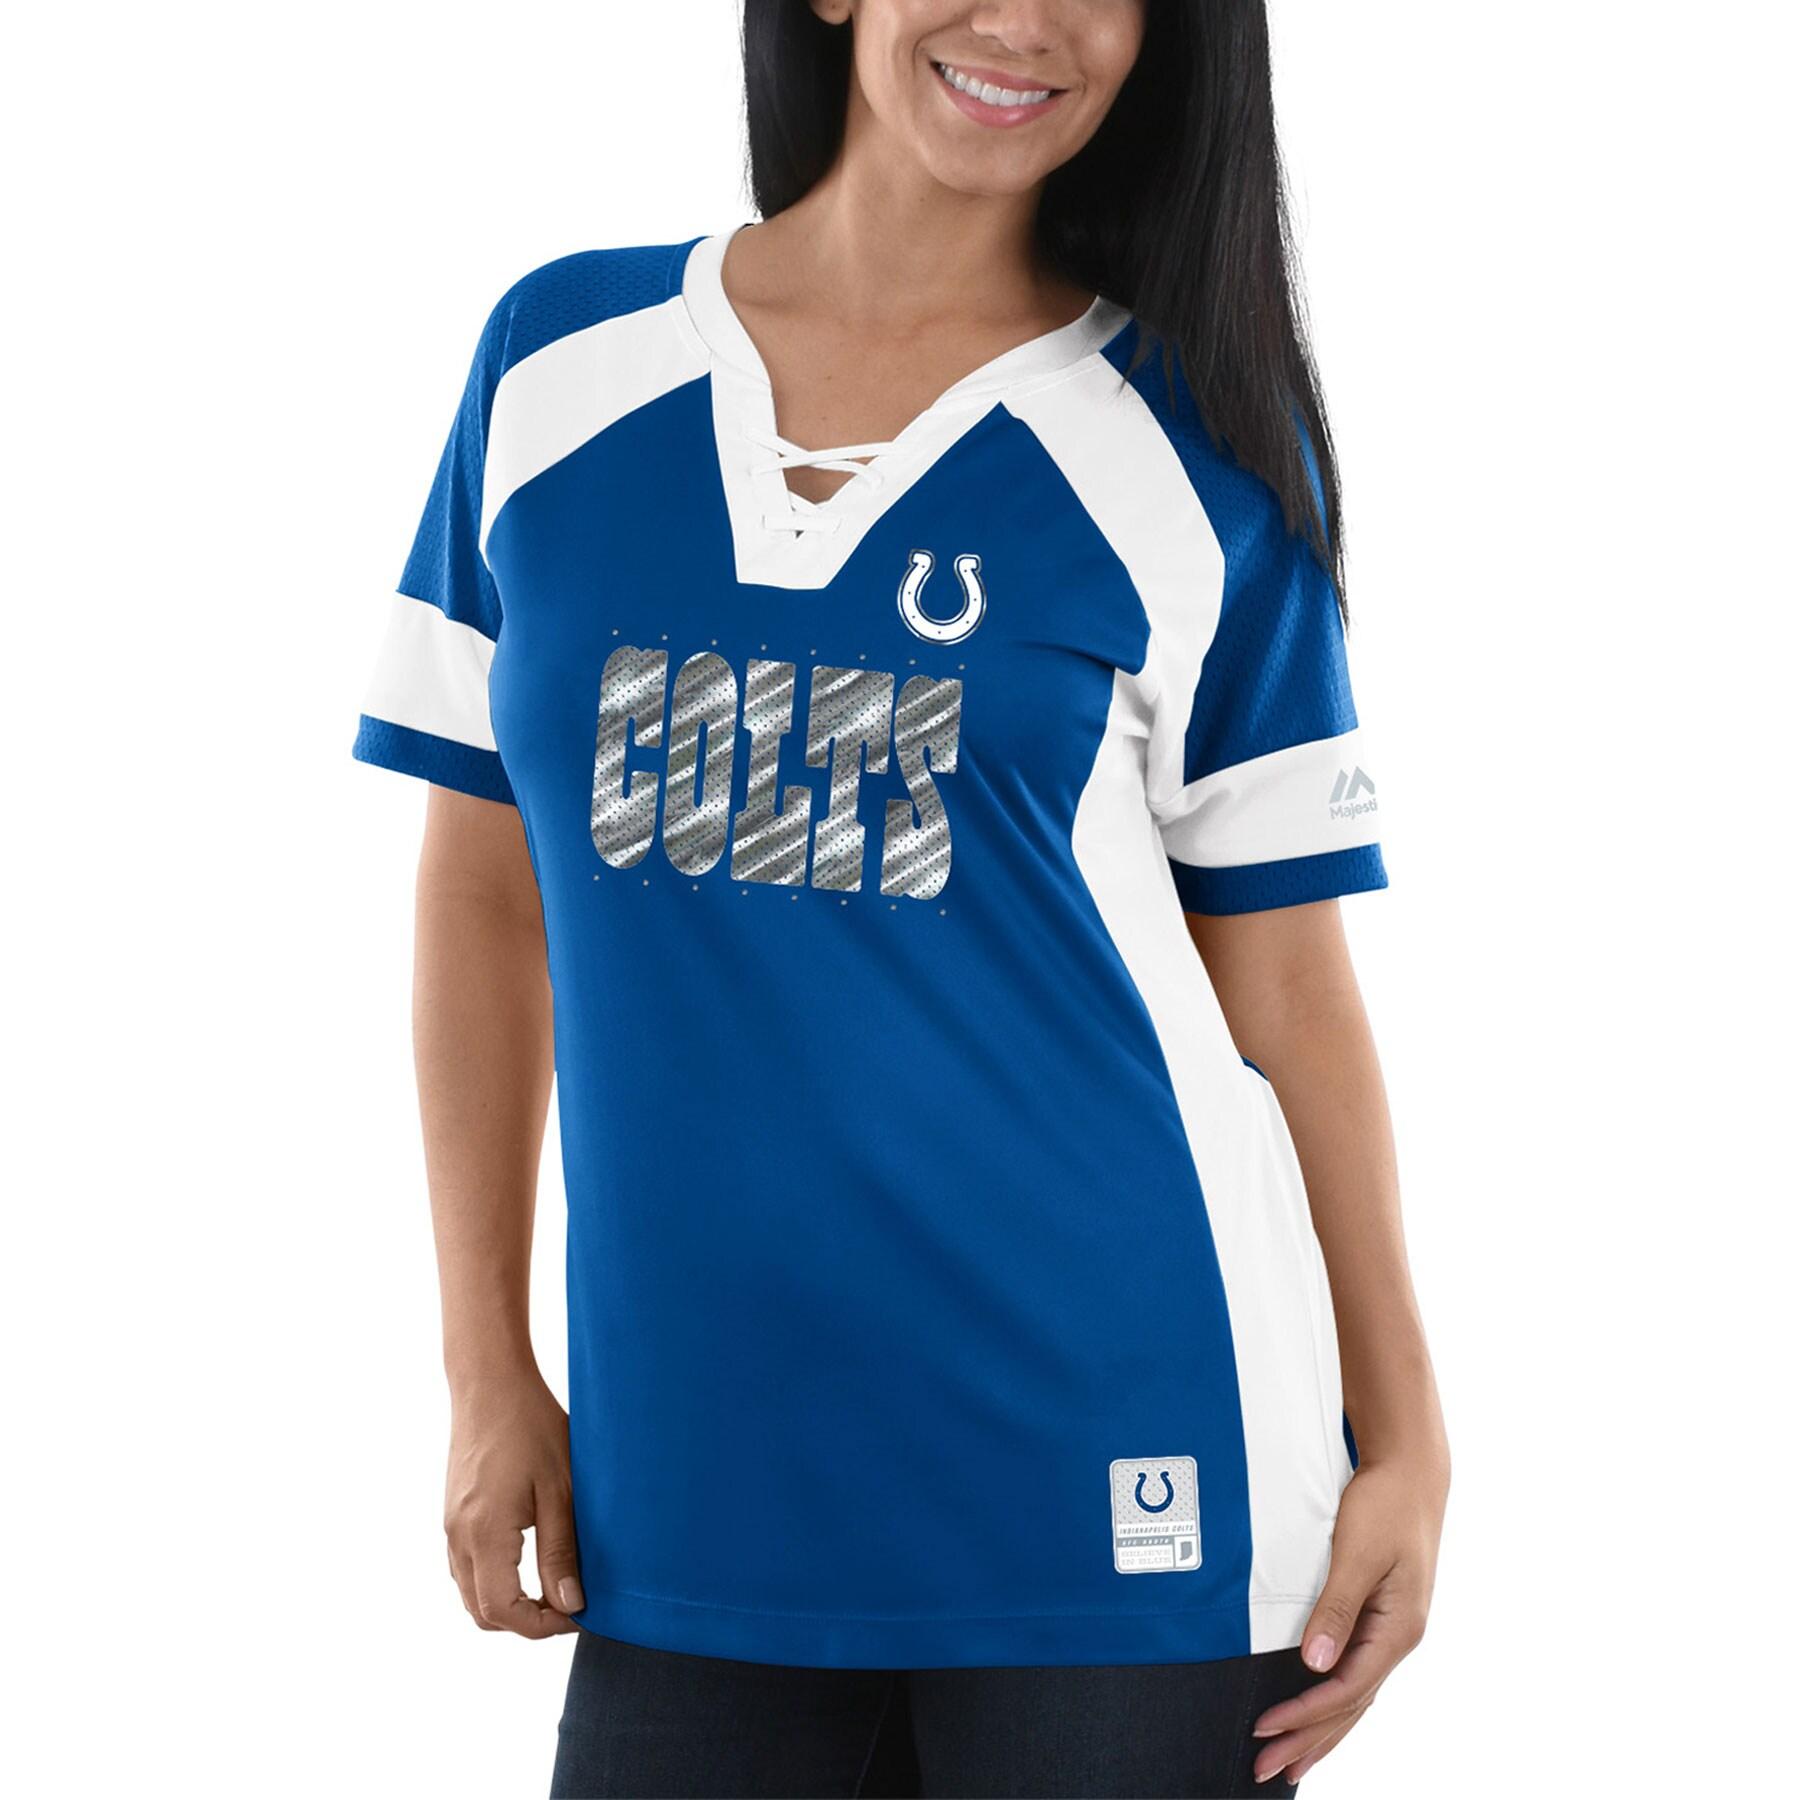 Indianapolis Colts Majestic Women's Draft Me V-Neck T-Shirt - Royal/White